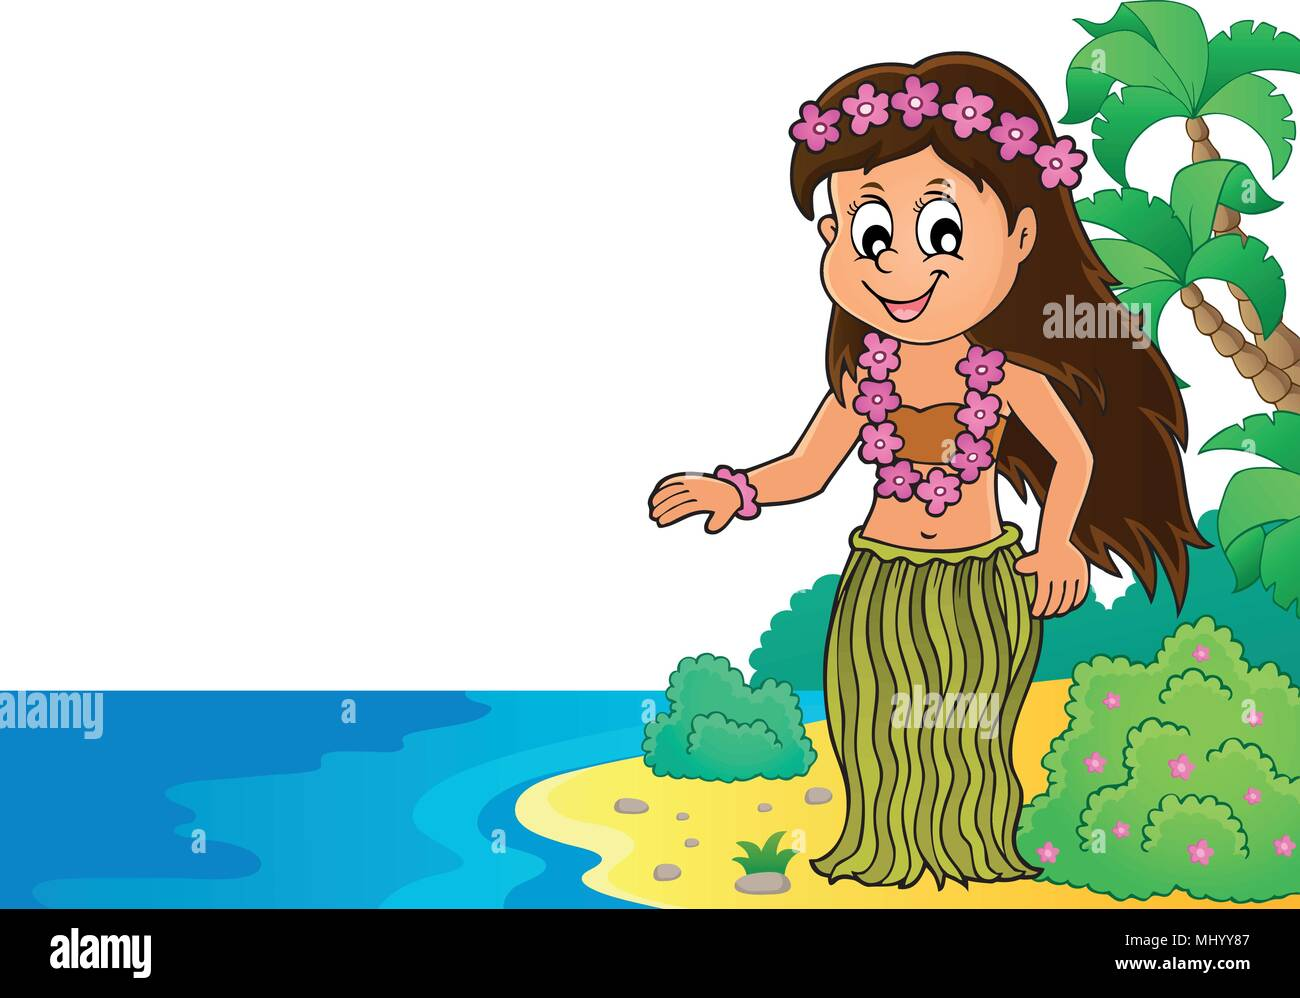 Hawaiian theme dancer image 2 - eps10 vector illustration. - Stock Vector